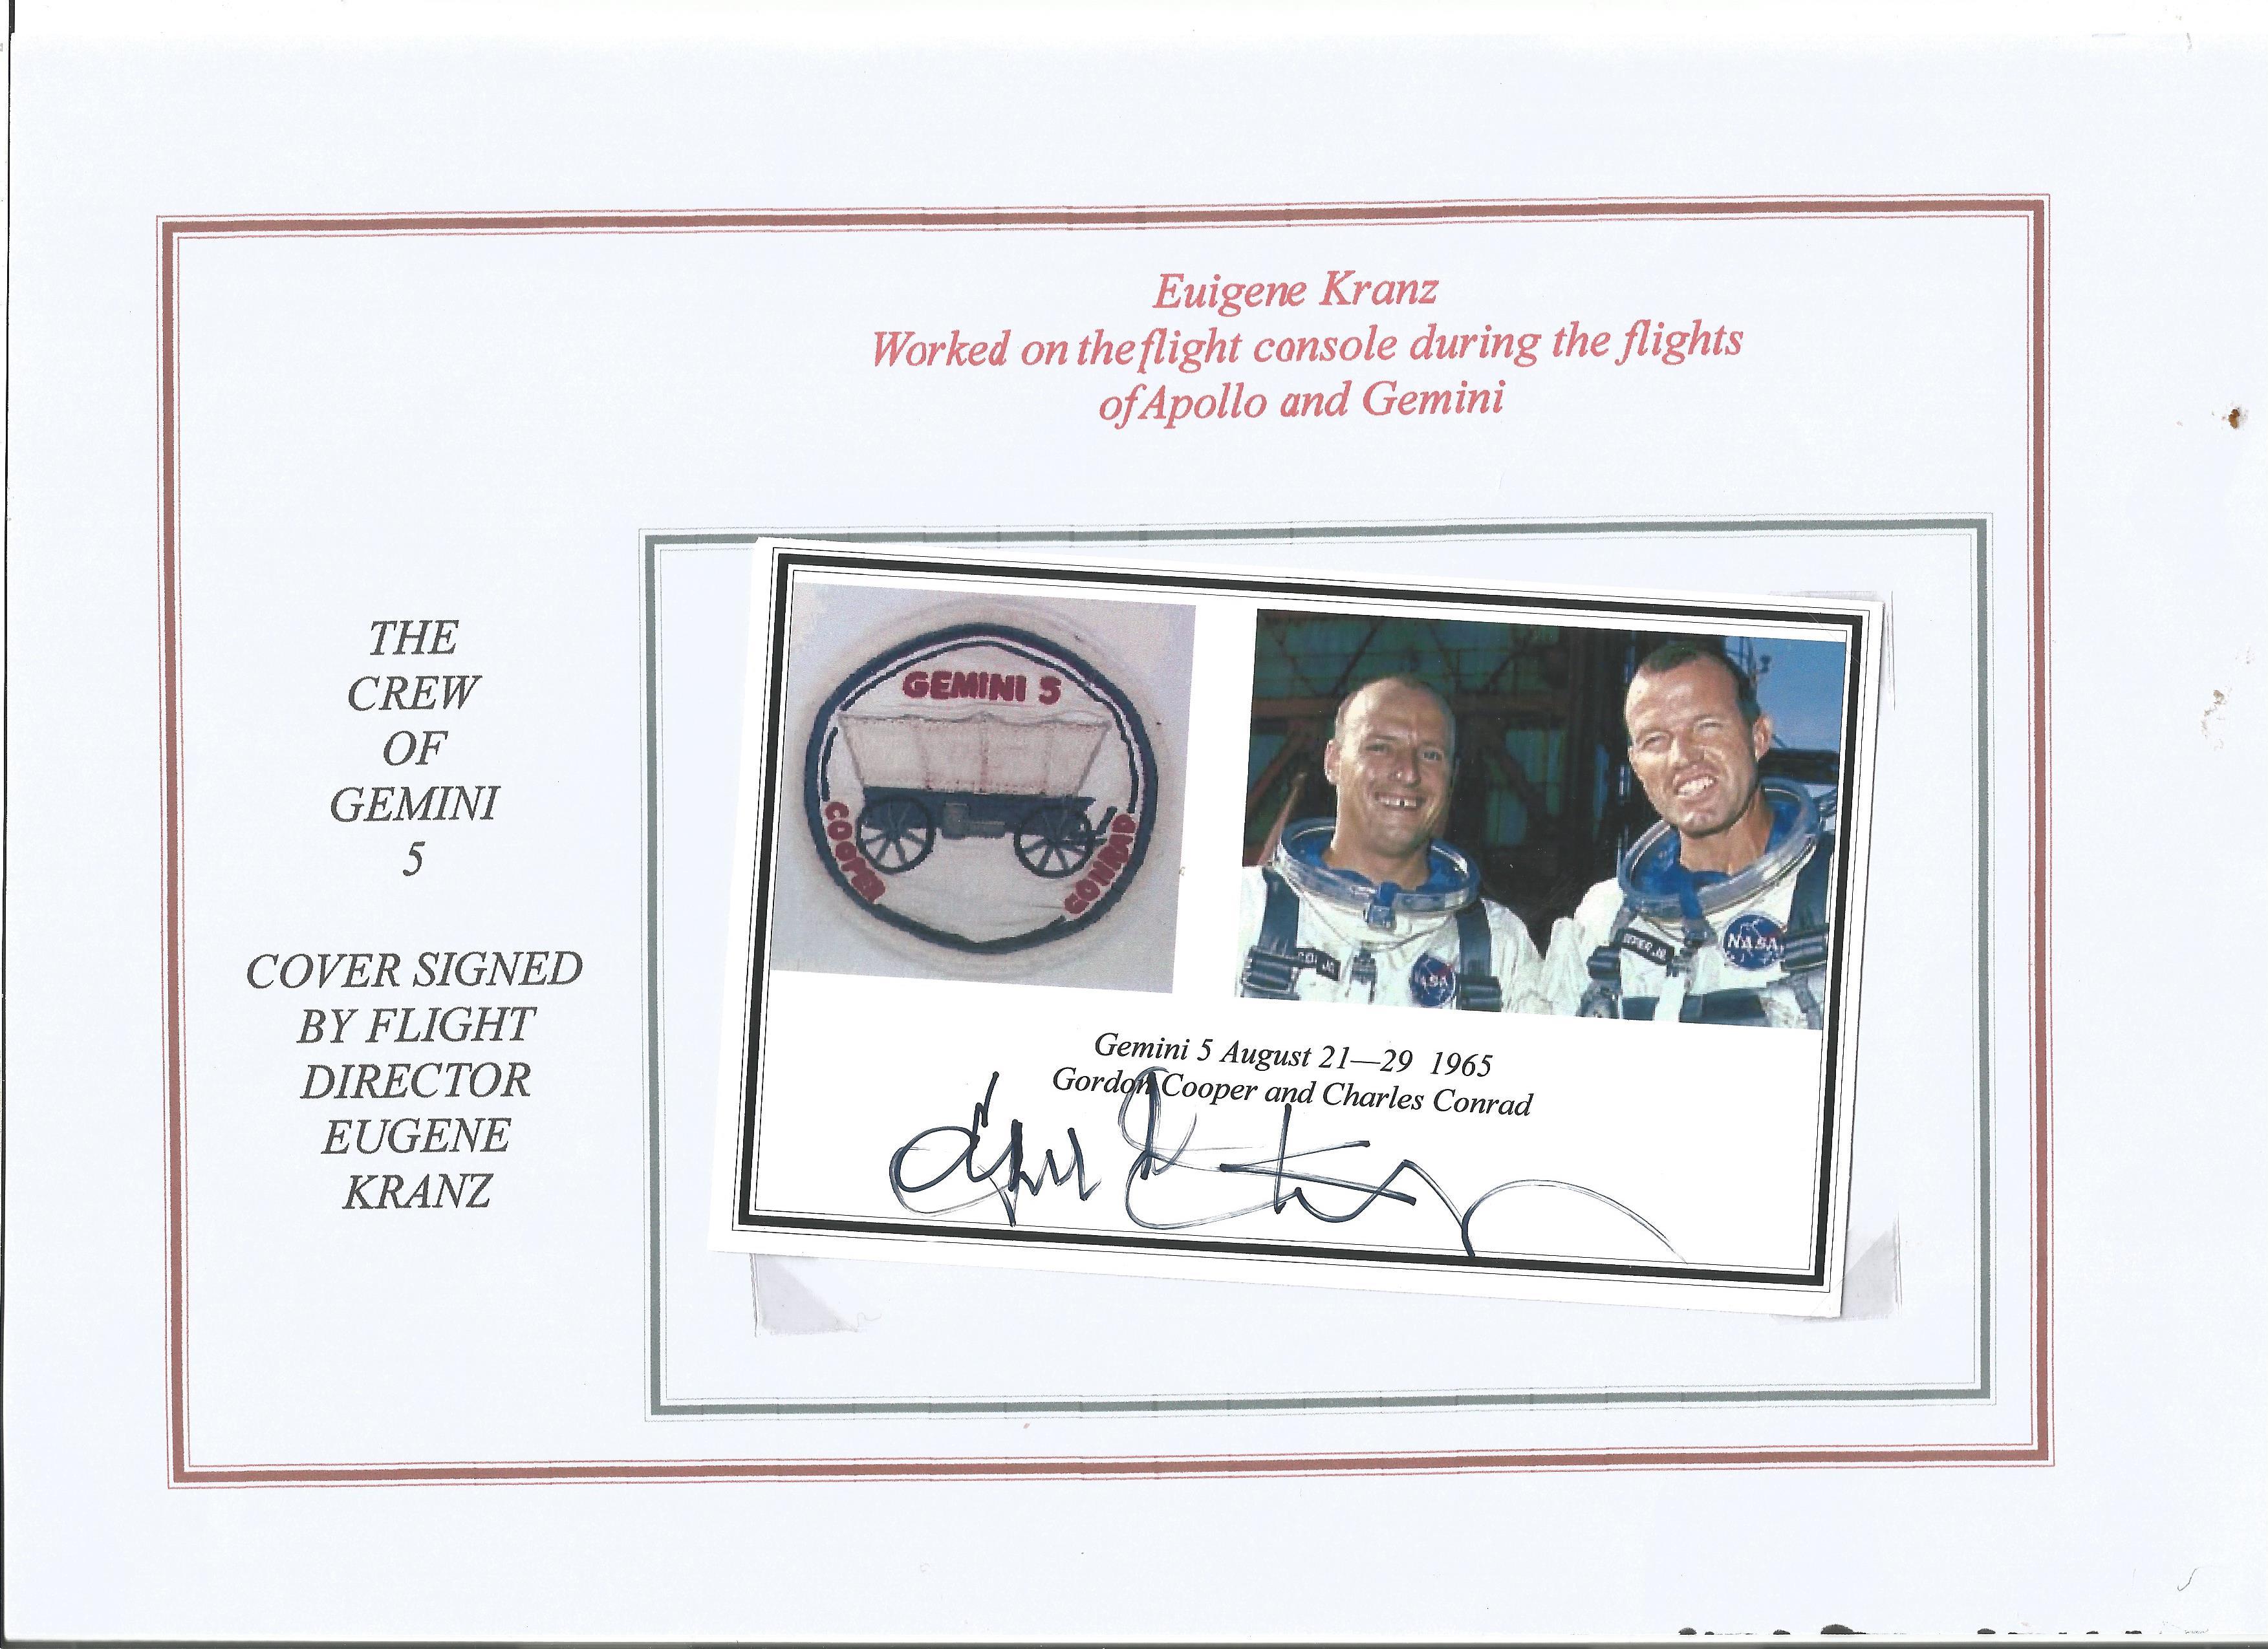 NASA Eugene Kranz signed Gemini 5 AUGUST 21-29, 1965, commemorative photo. Eugene Francis Gene Kranz